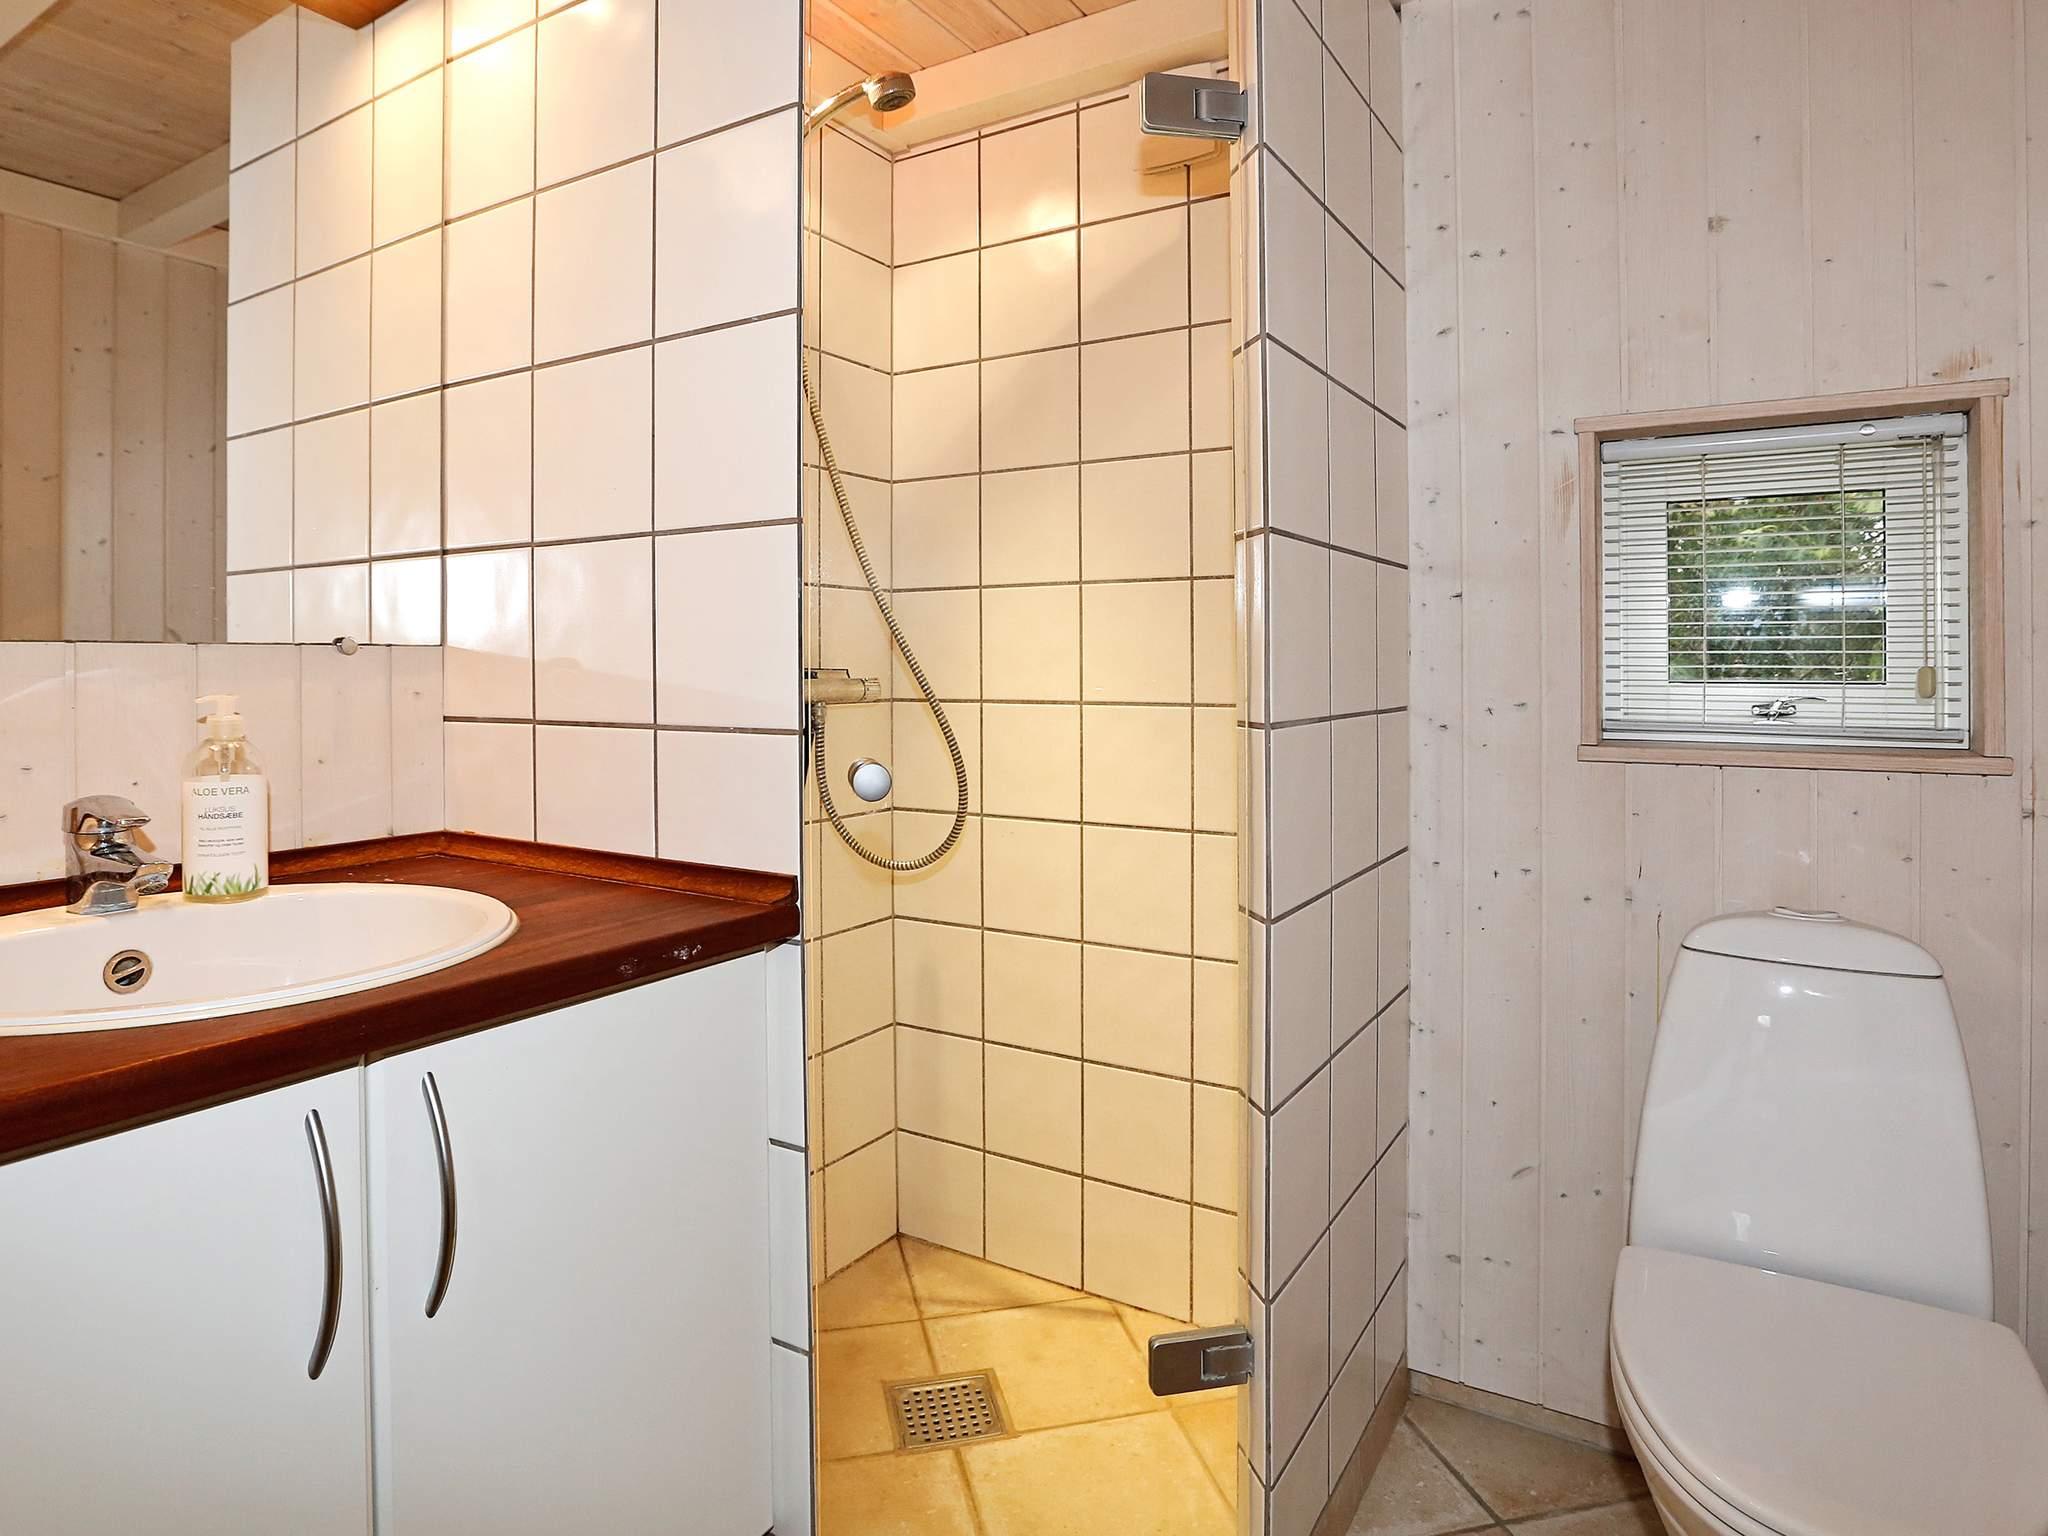 Maison de vacances Skibby (124927), Kirke Hyllinge, , Seeland Nord, Danemark, image 12